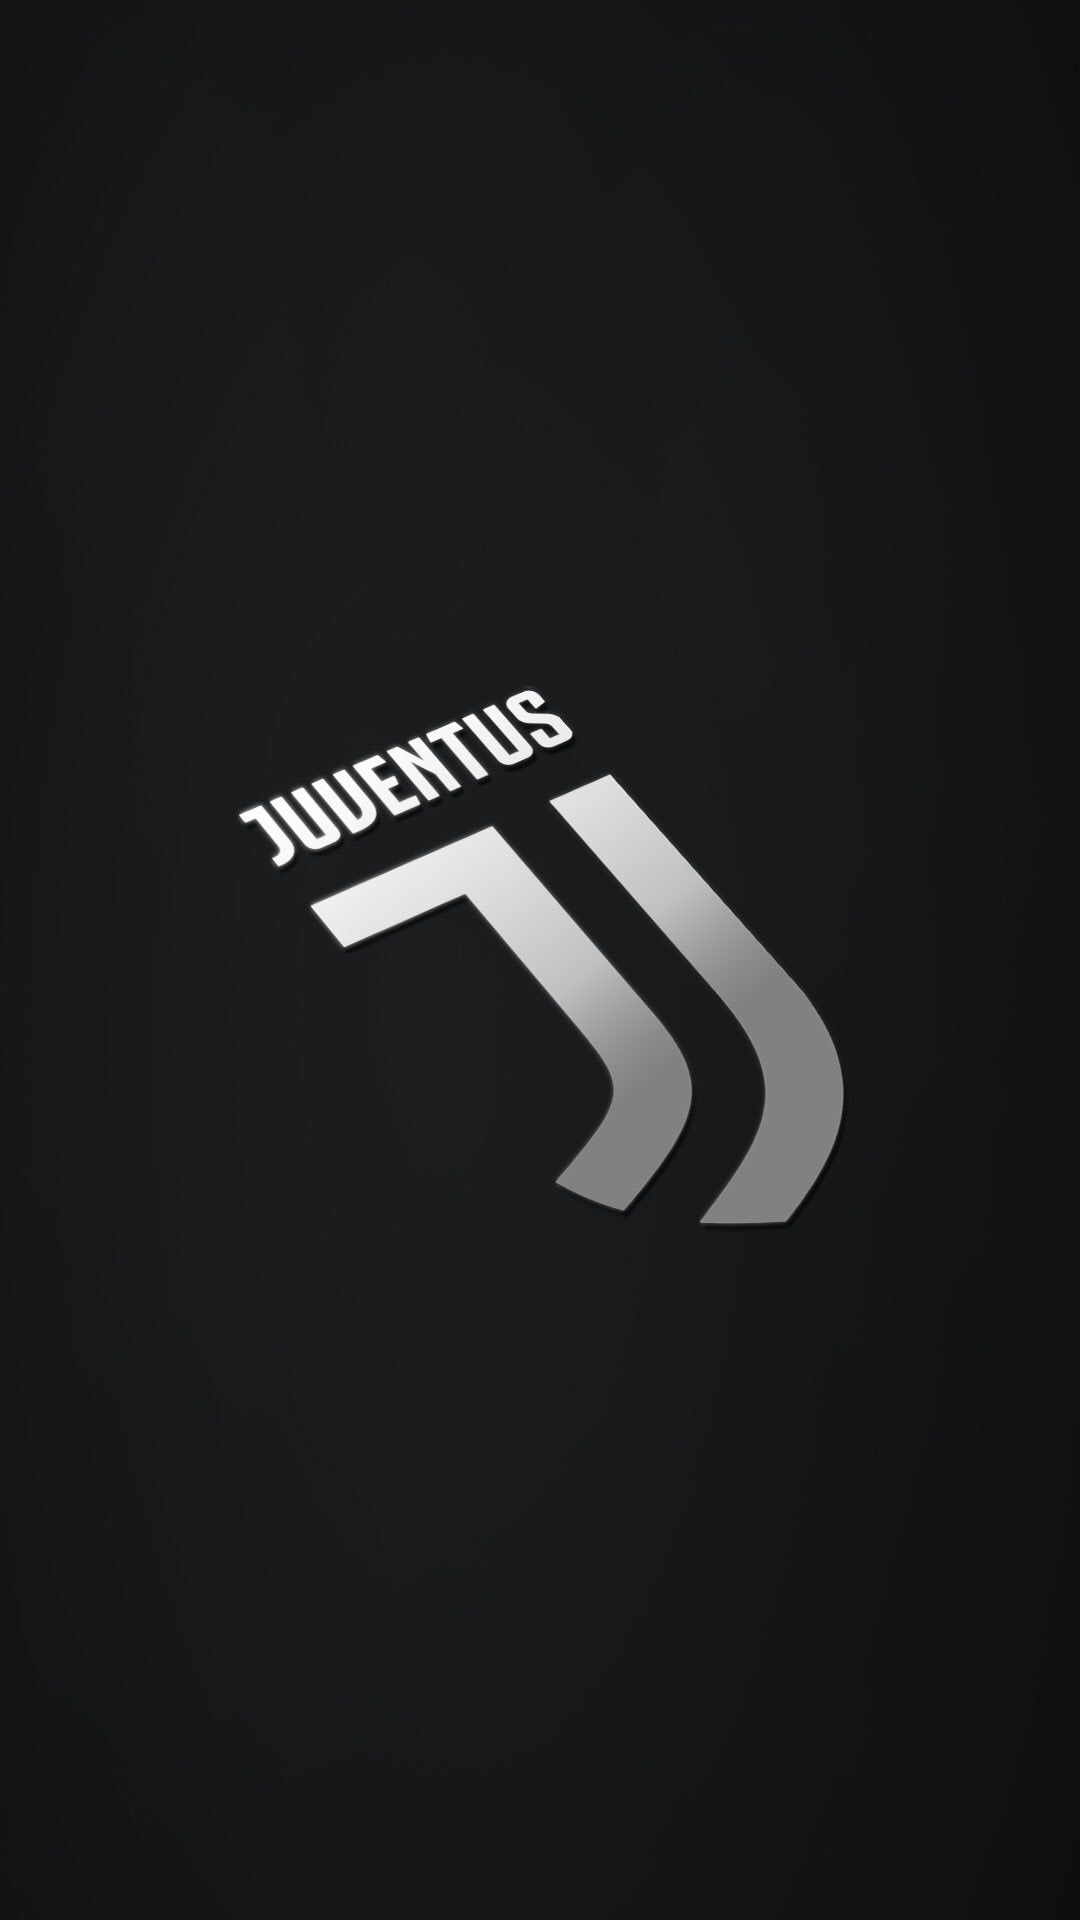 Pin By J U N A S Mundu On Juve Wallpapers Juventus Wallpapers Soccer World Juventus Soccer